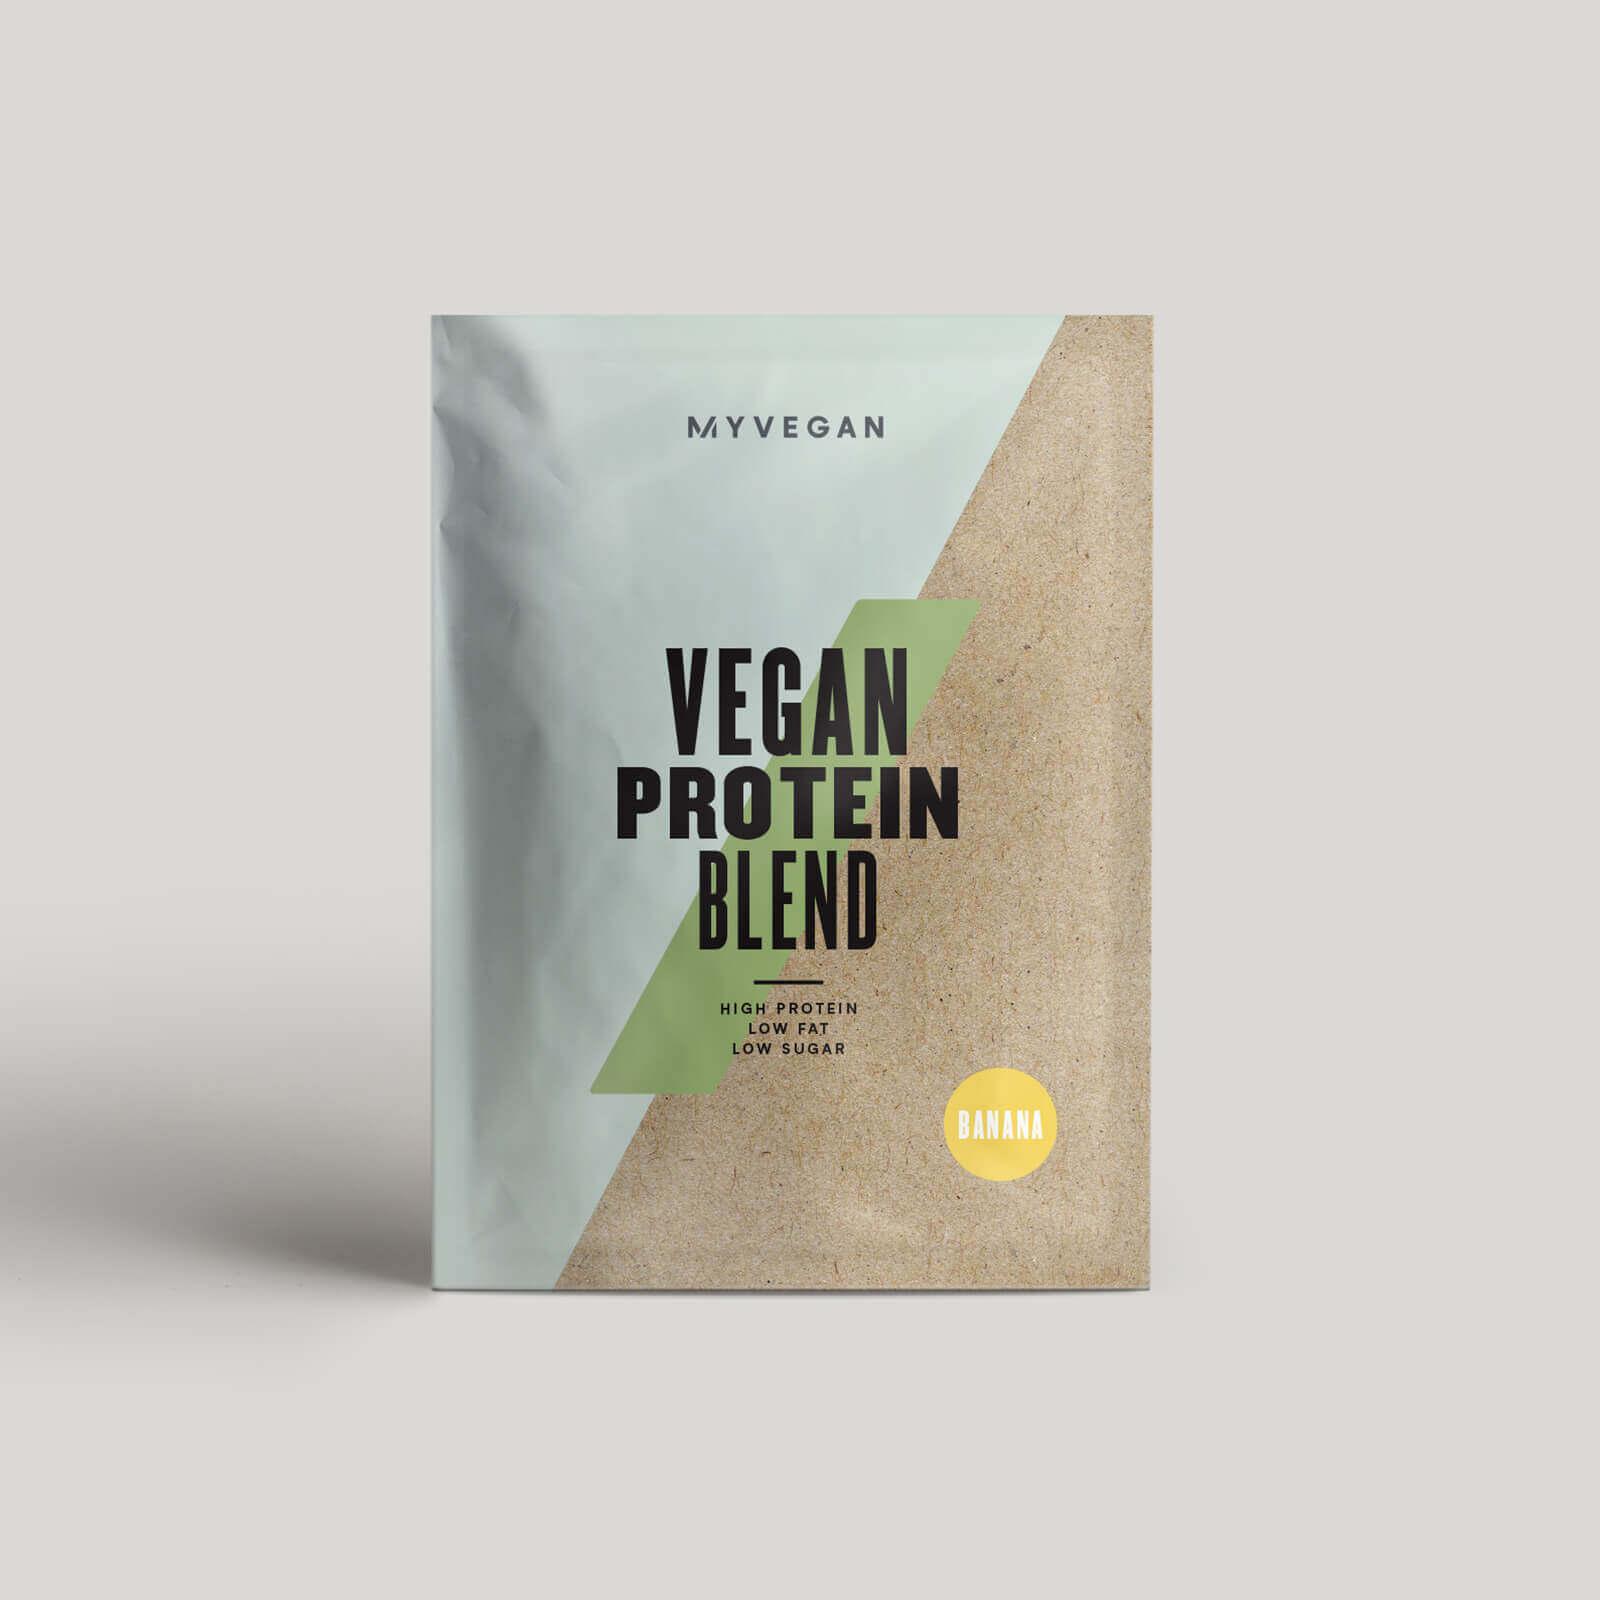 Myvegan Vegan Protein Blend (Sample) - 30g - Blueberry and Cinnamon